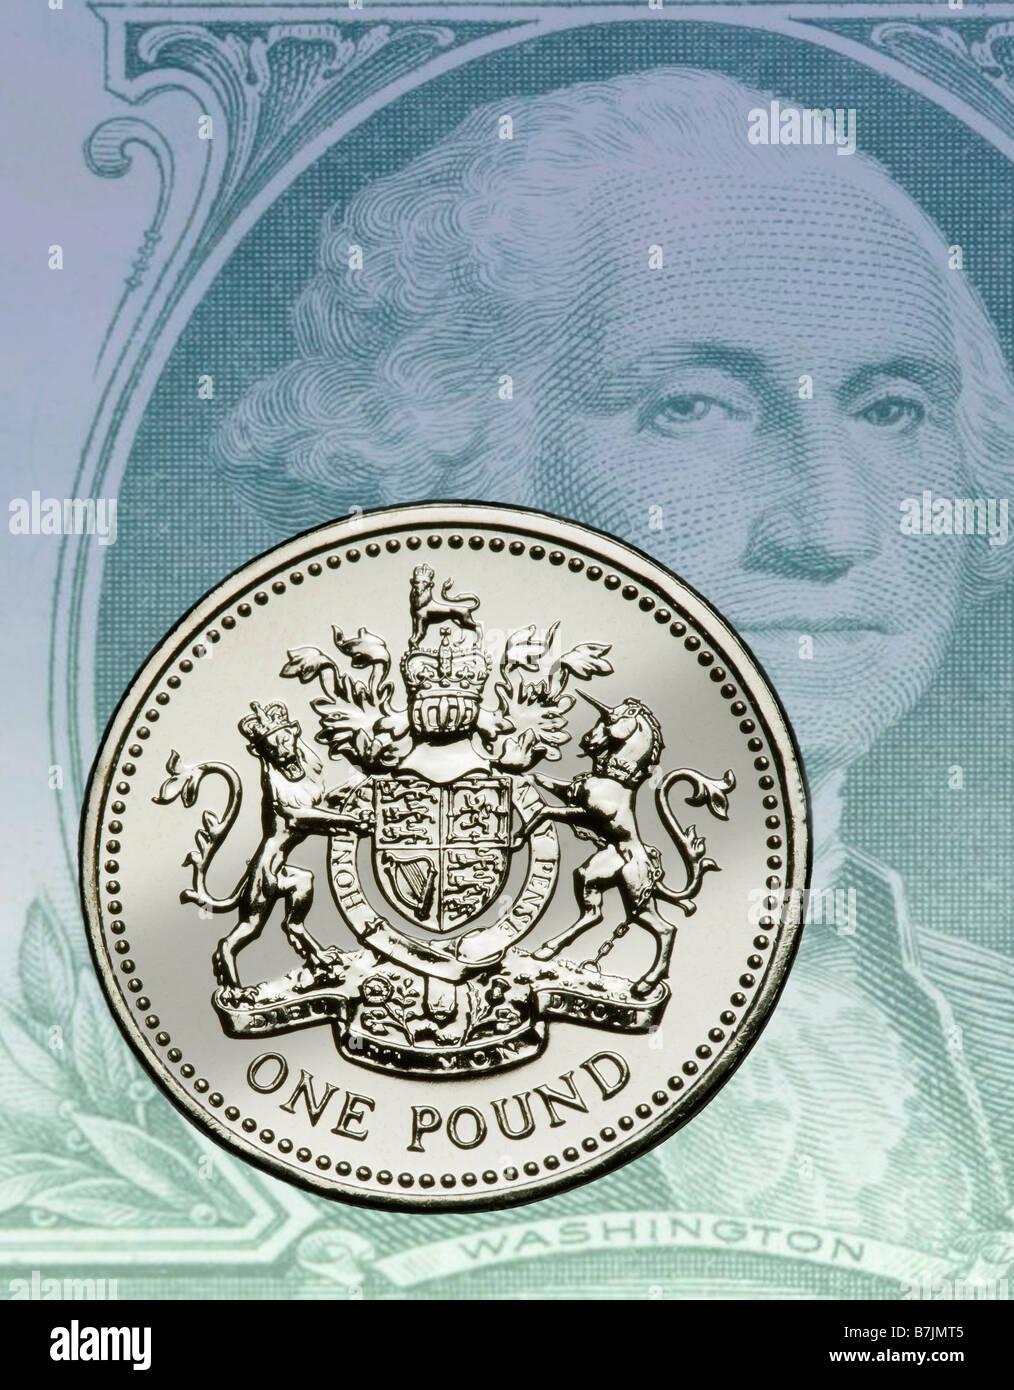 British Pound Coin Dollar Bill Stock Photo Royalty Free